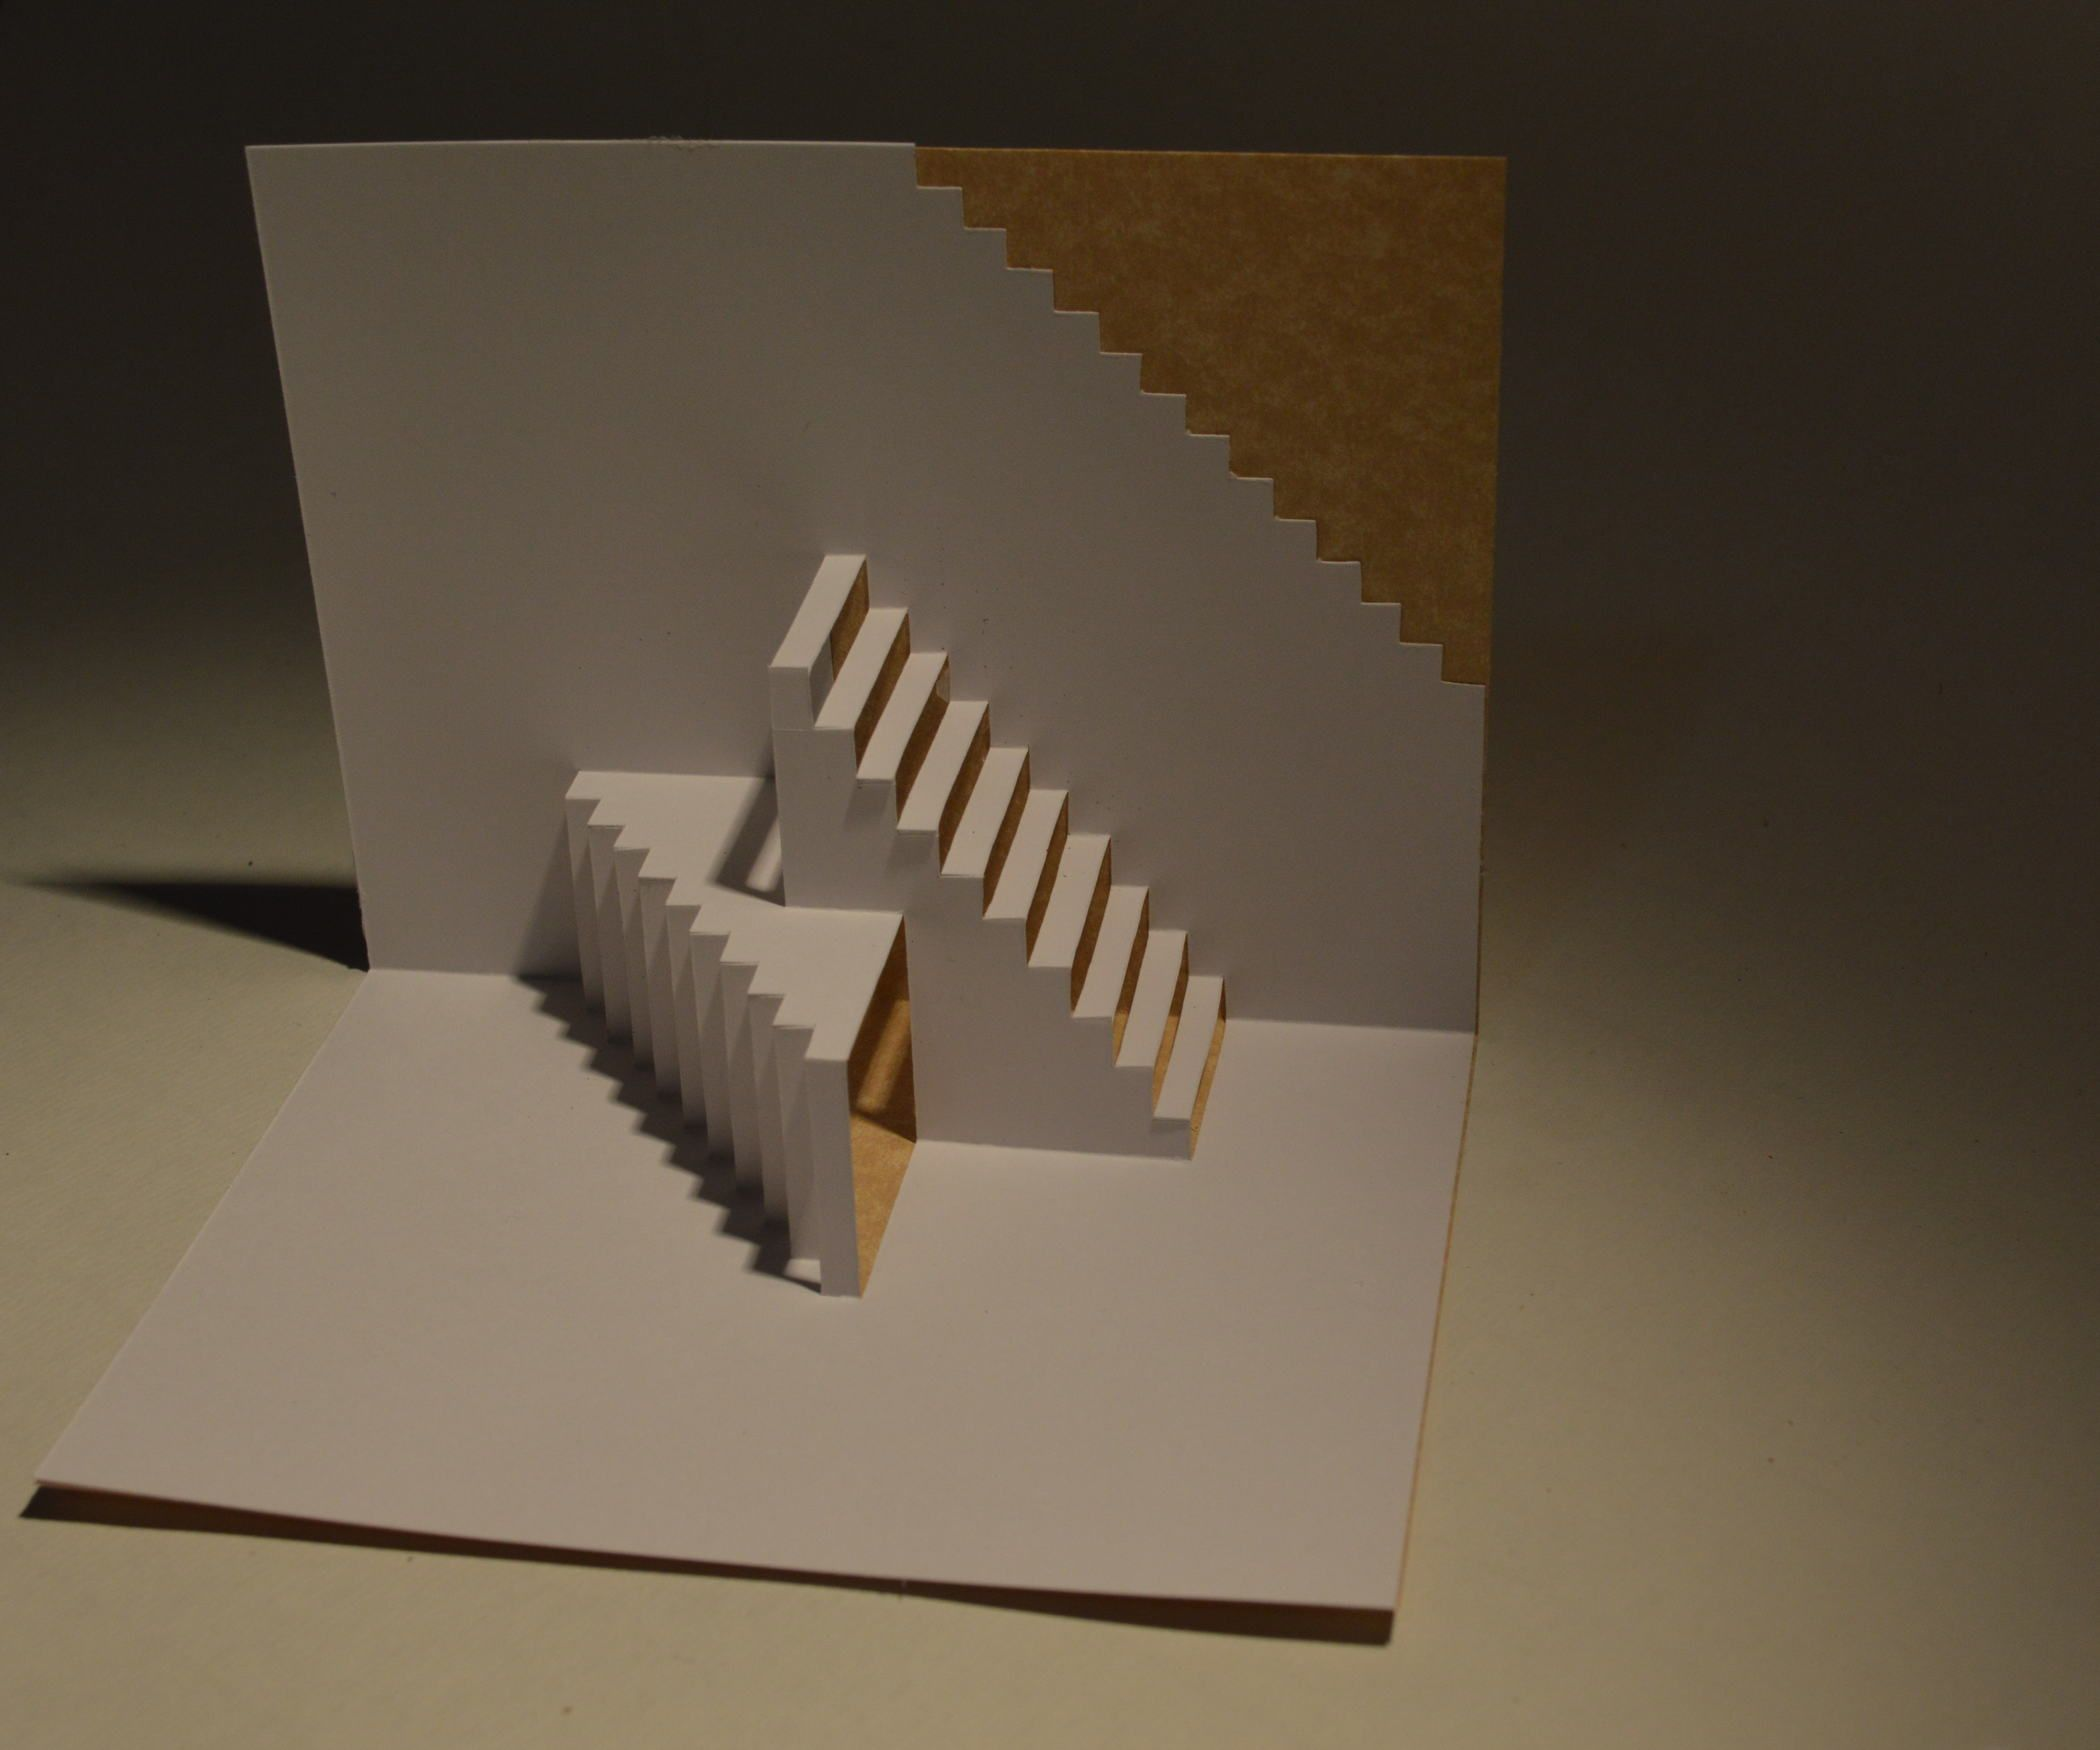 открытка лесенка шаблон муравьи